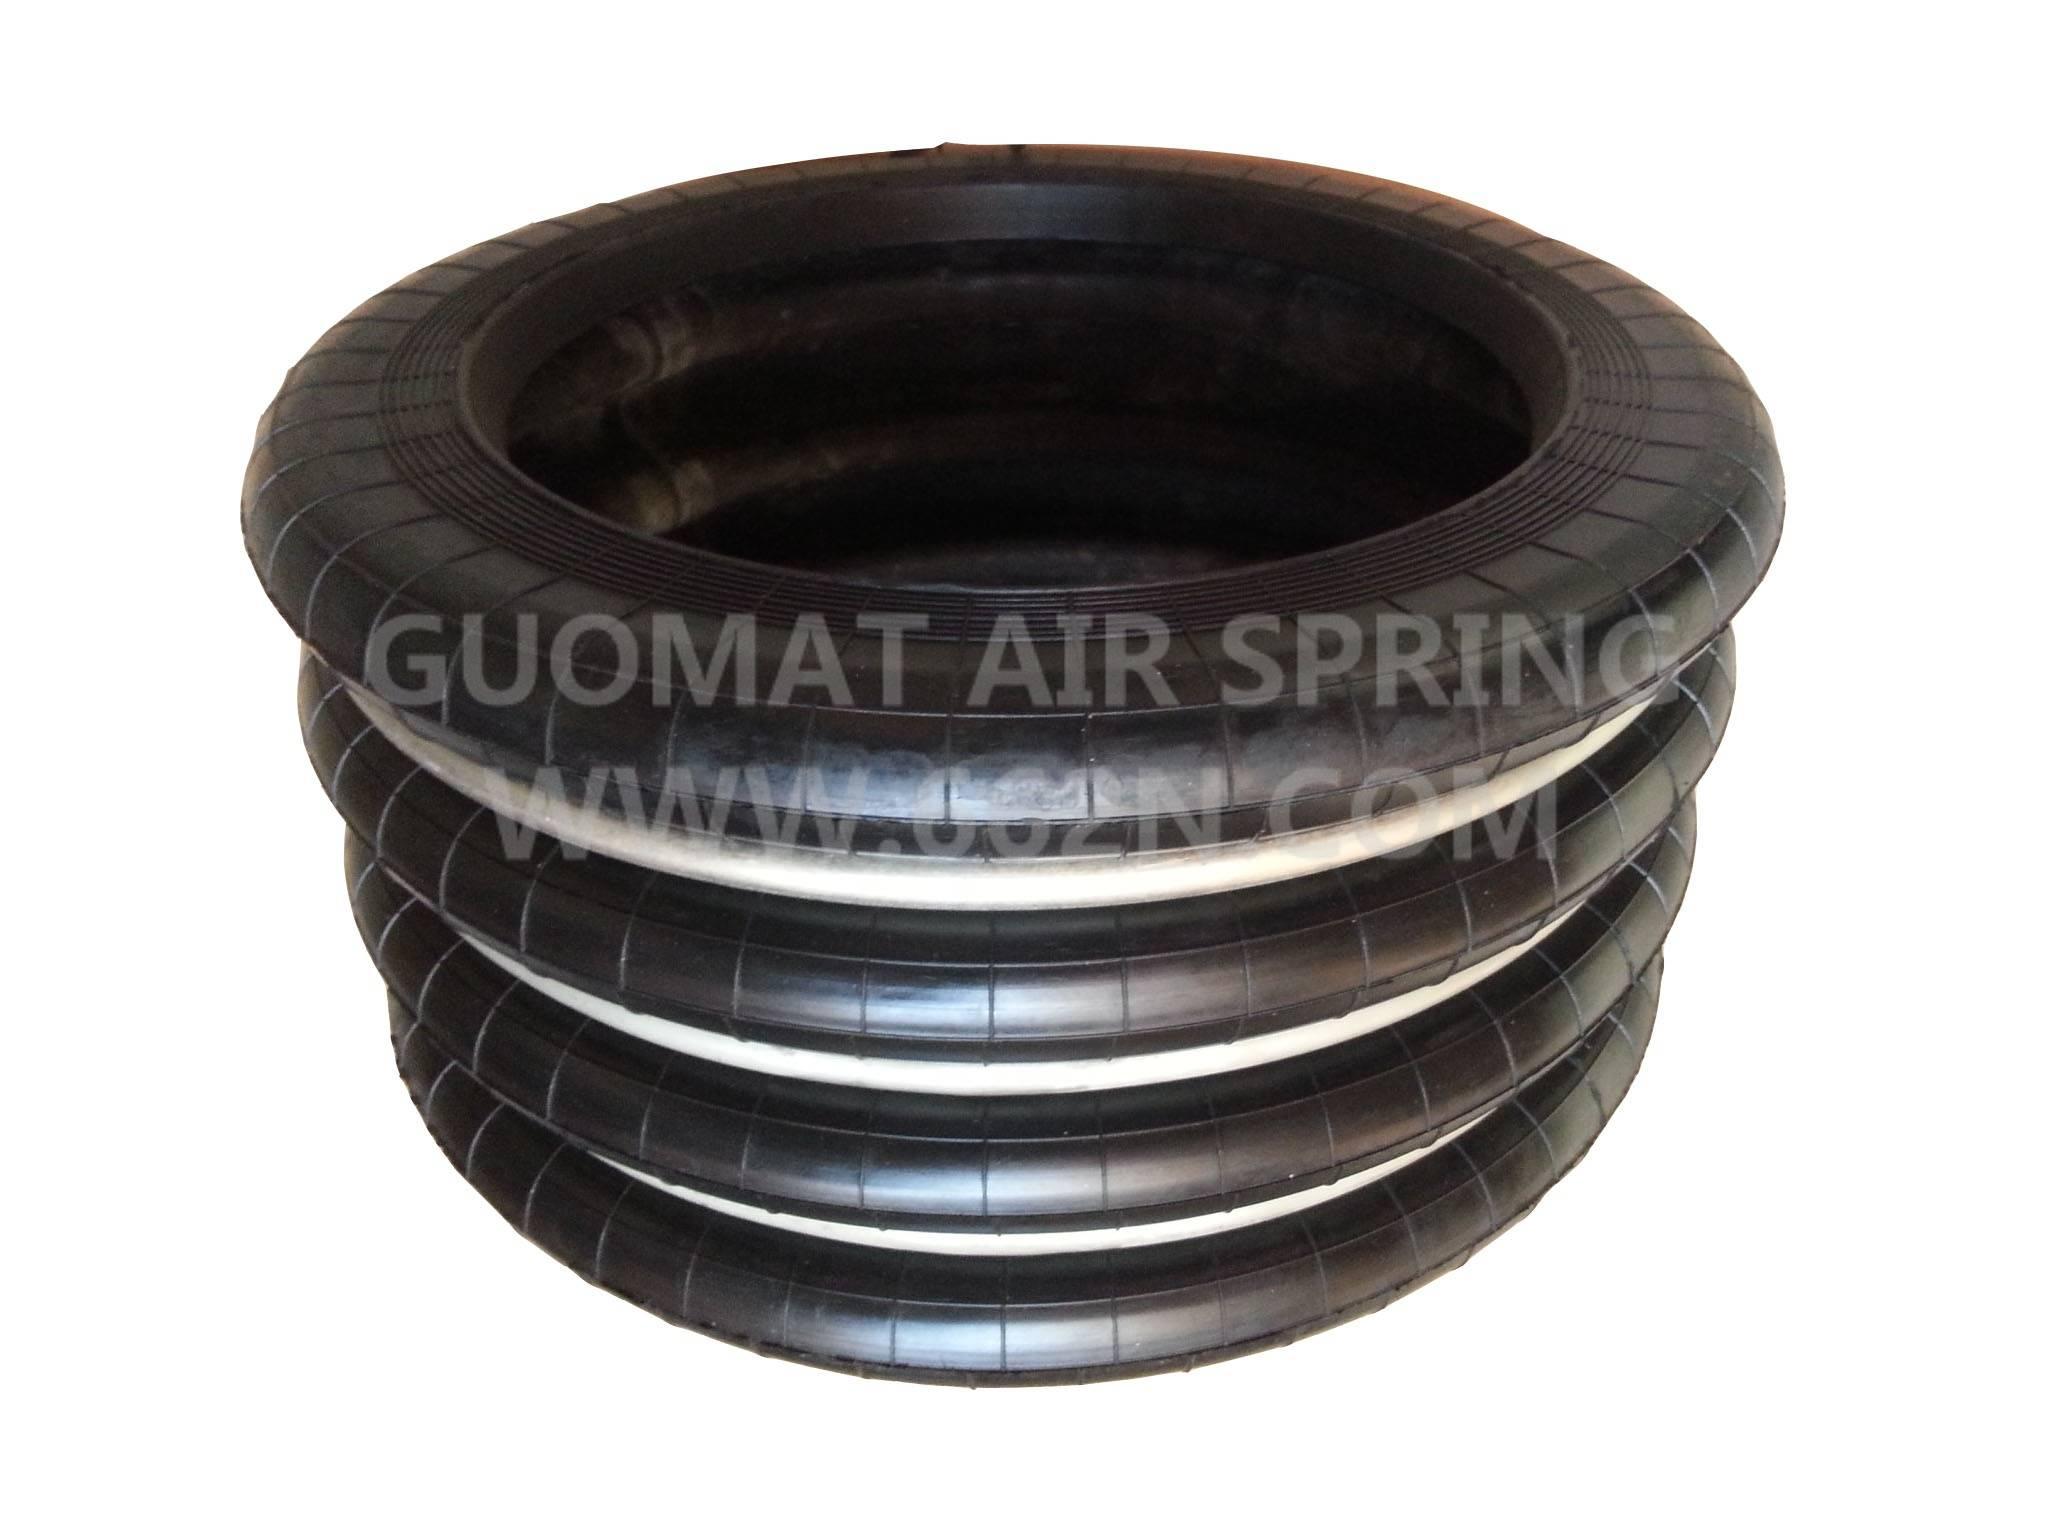 S-400-4R YOKOHAMA punching machine rubber air spring